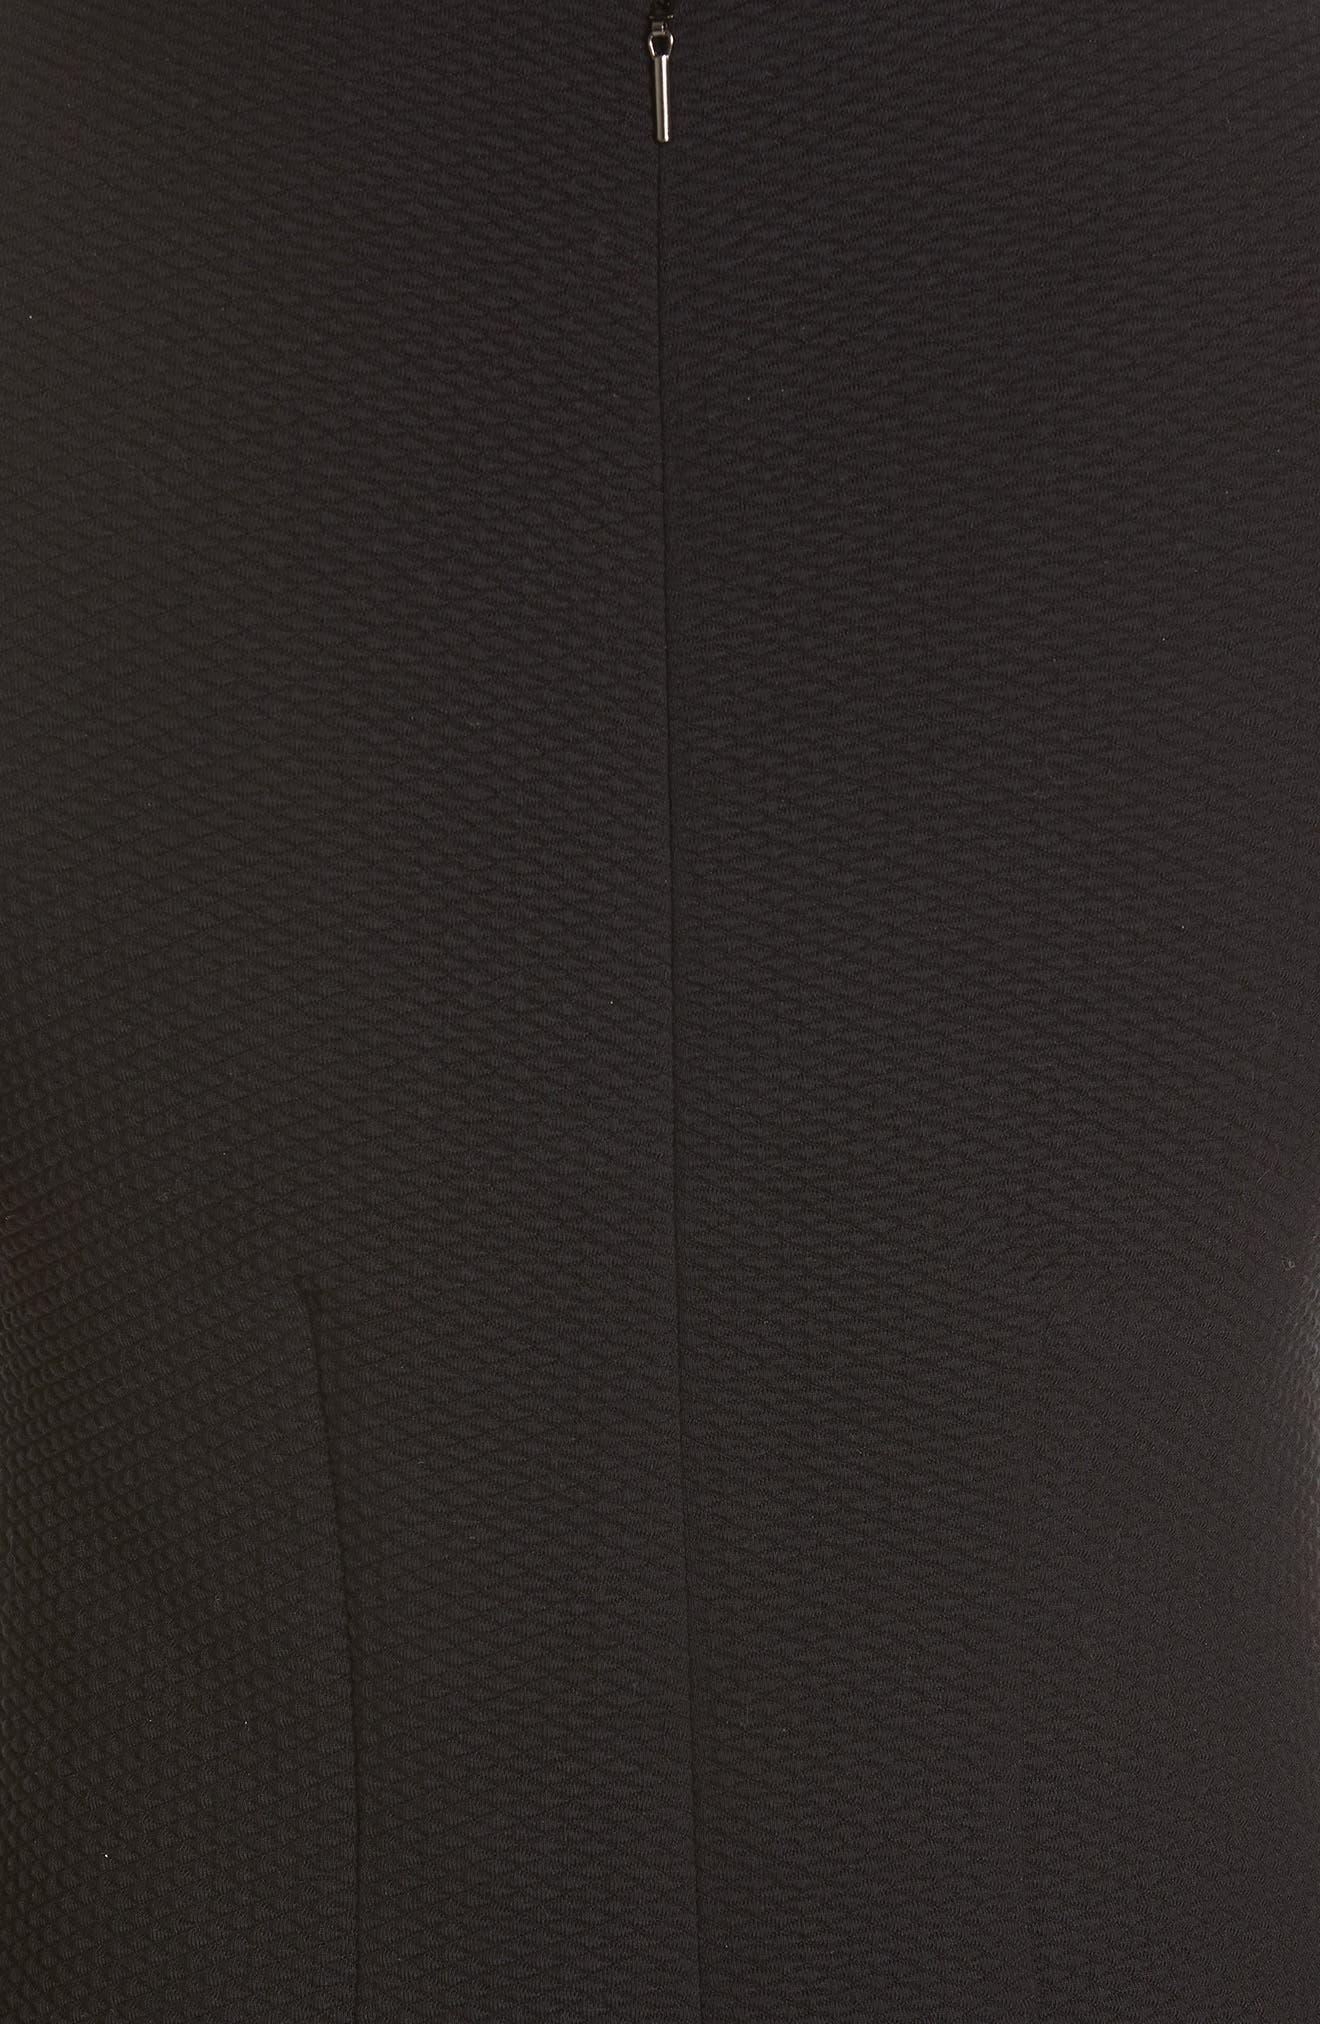 REBECCA TAYLOR, Fit & Flare Dress, Alternate thumbnail 5, color, BLACK